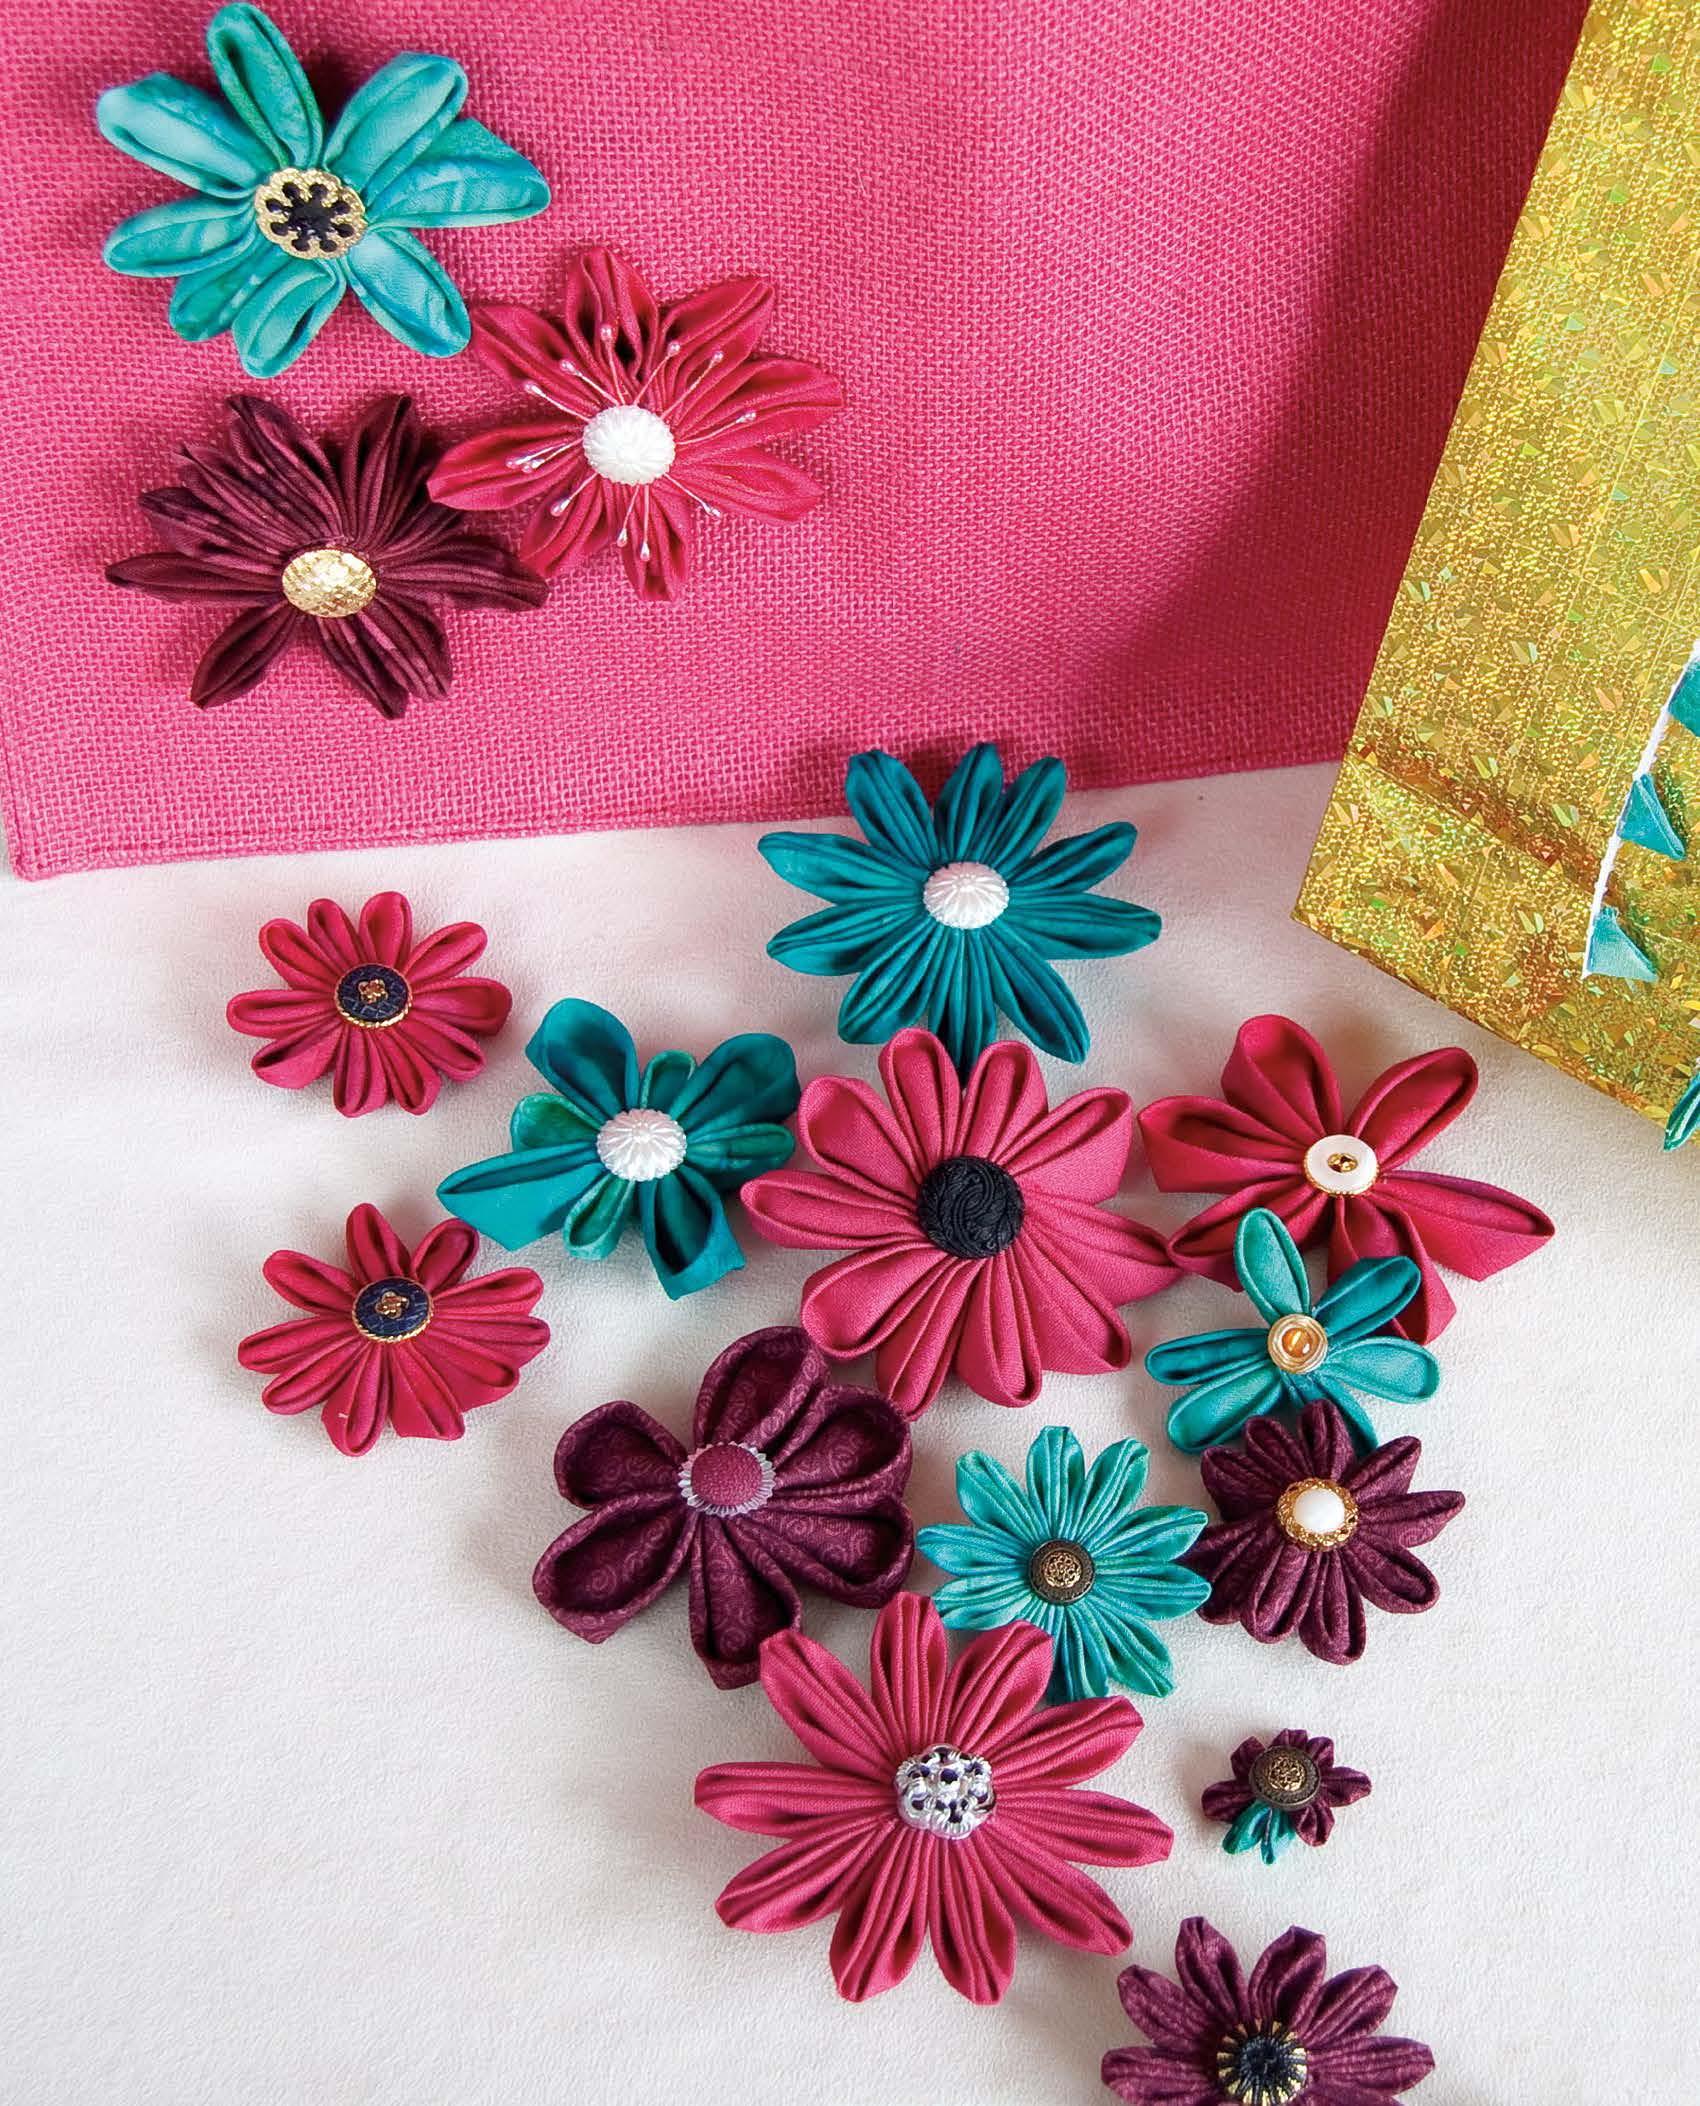 Flowerz Kanzashi Petals Pattern - Festive 2011